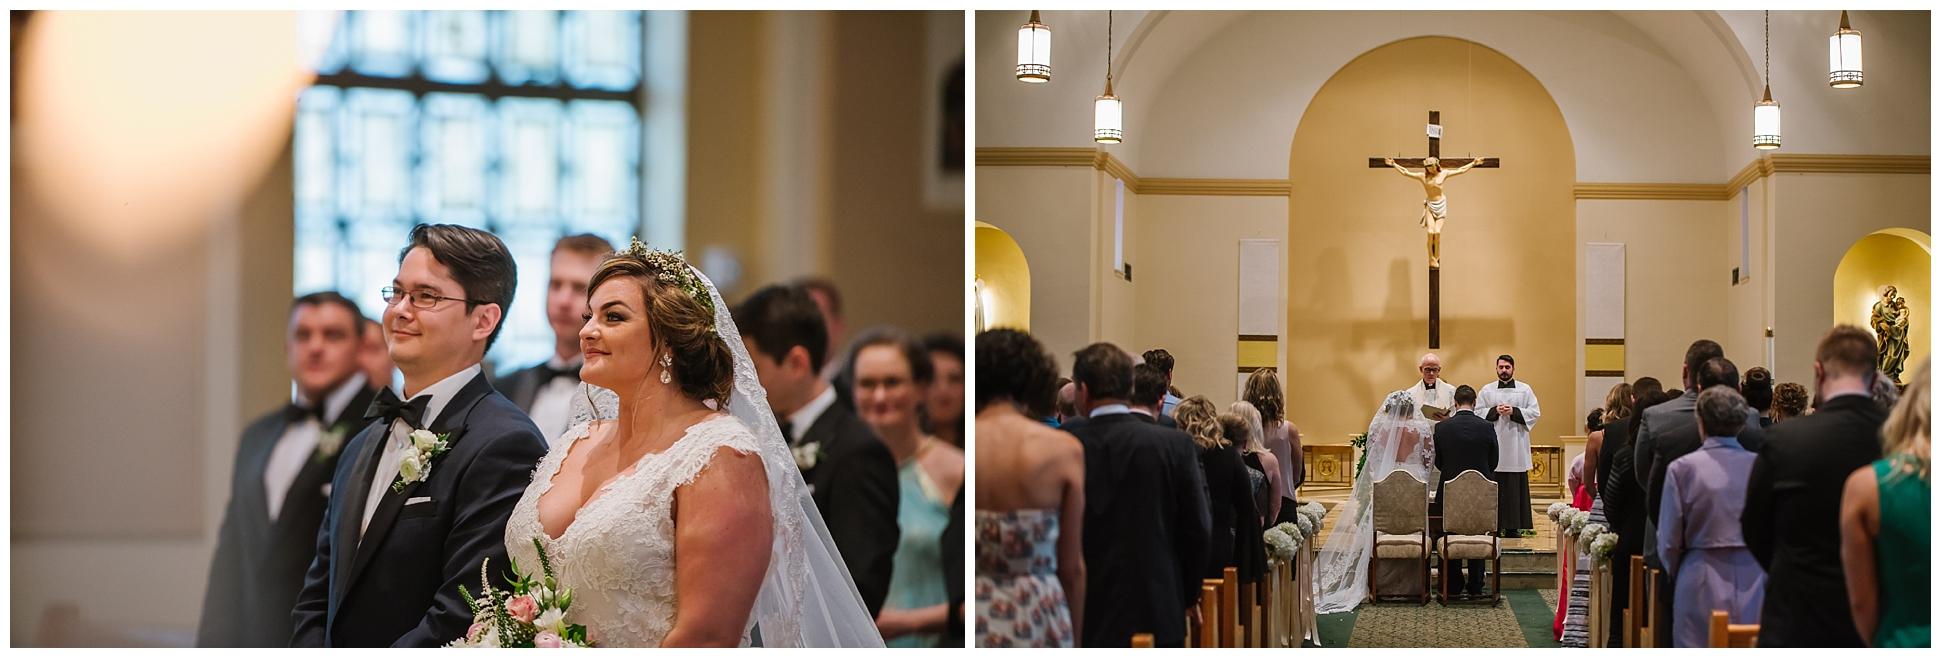 st-pete-wedding-photographer-italian-romance-theme-rustic-flower-crown_0397.jpg